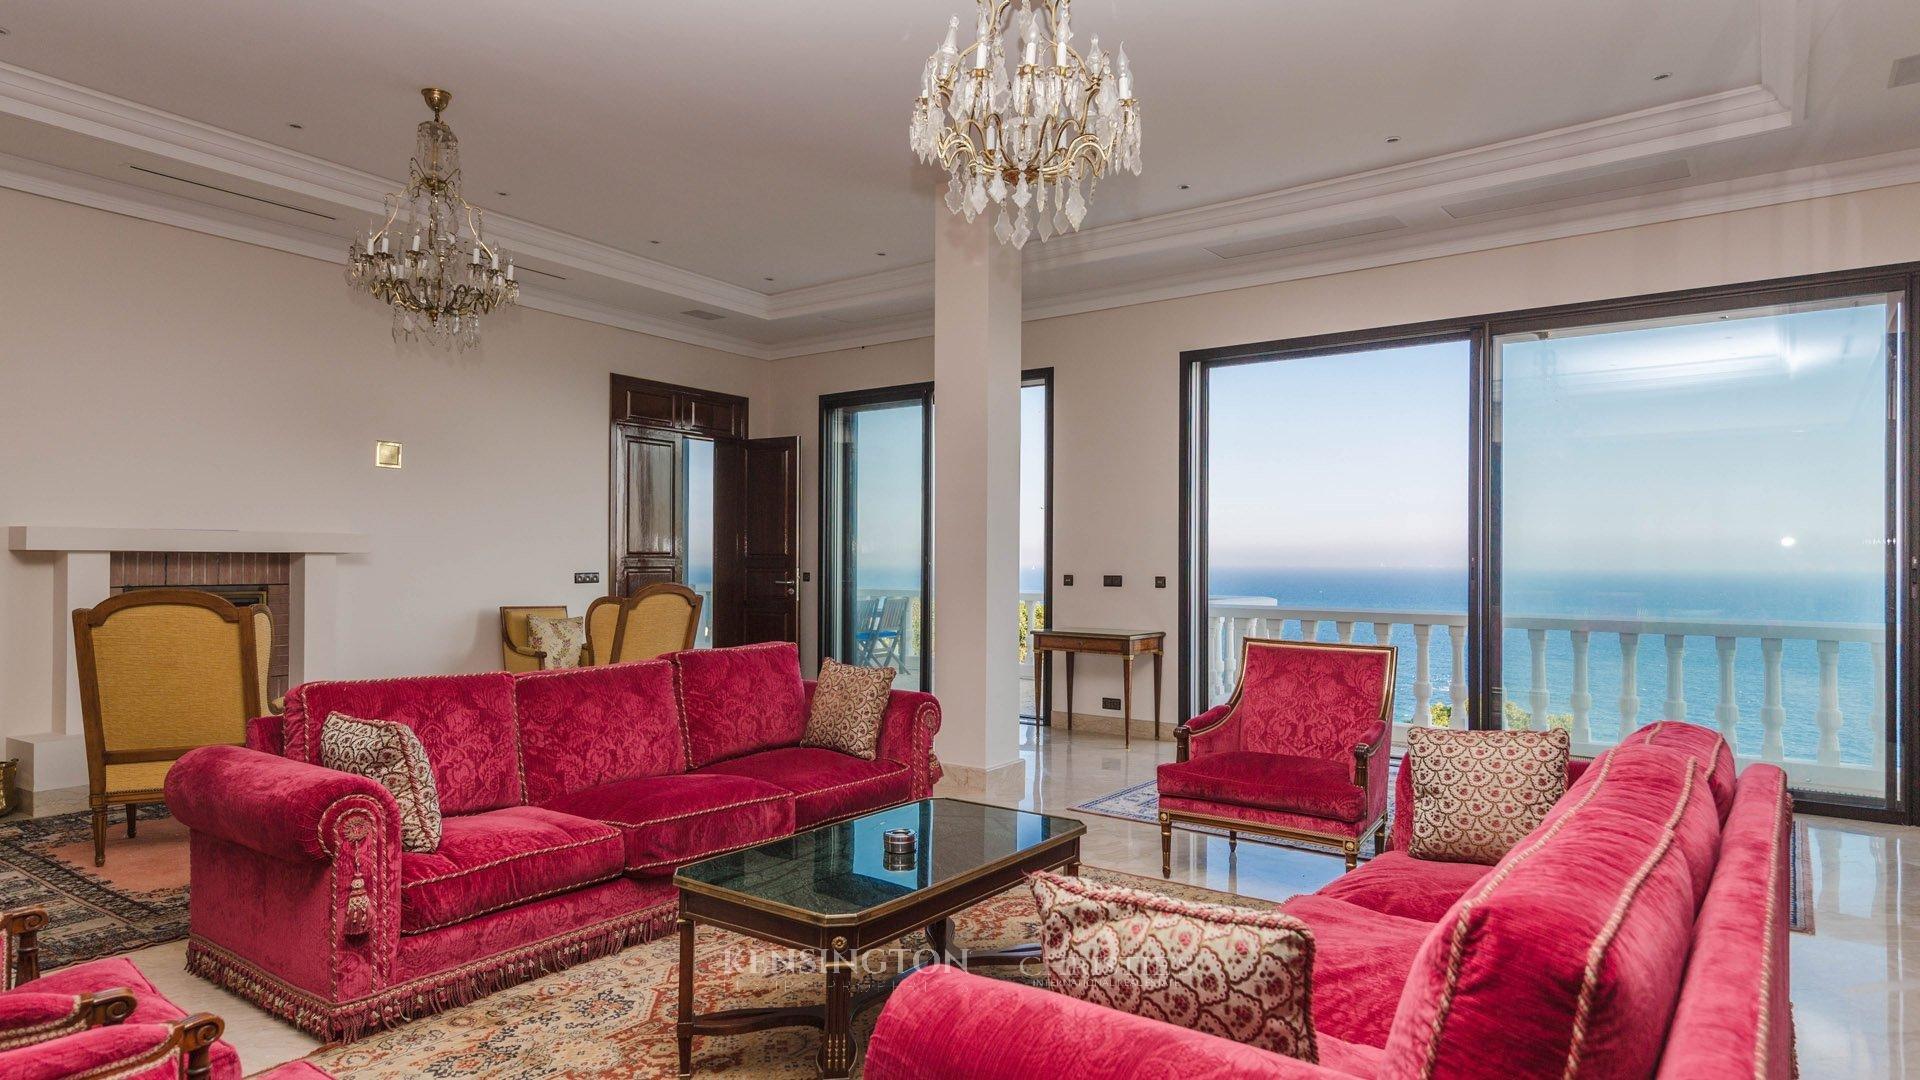 KPPM00802: El Borj Tangier Luxury Villa Tanger Morocco